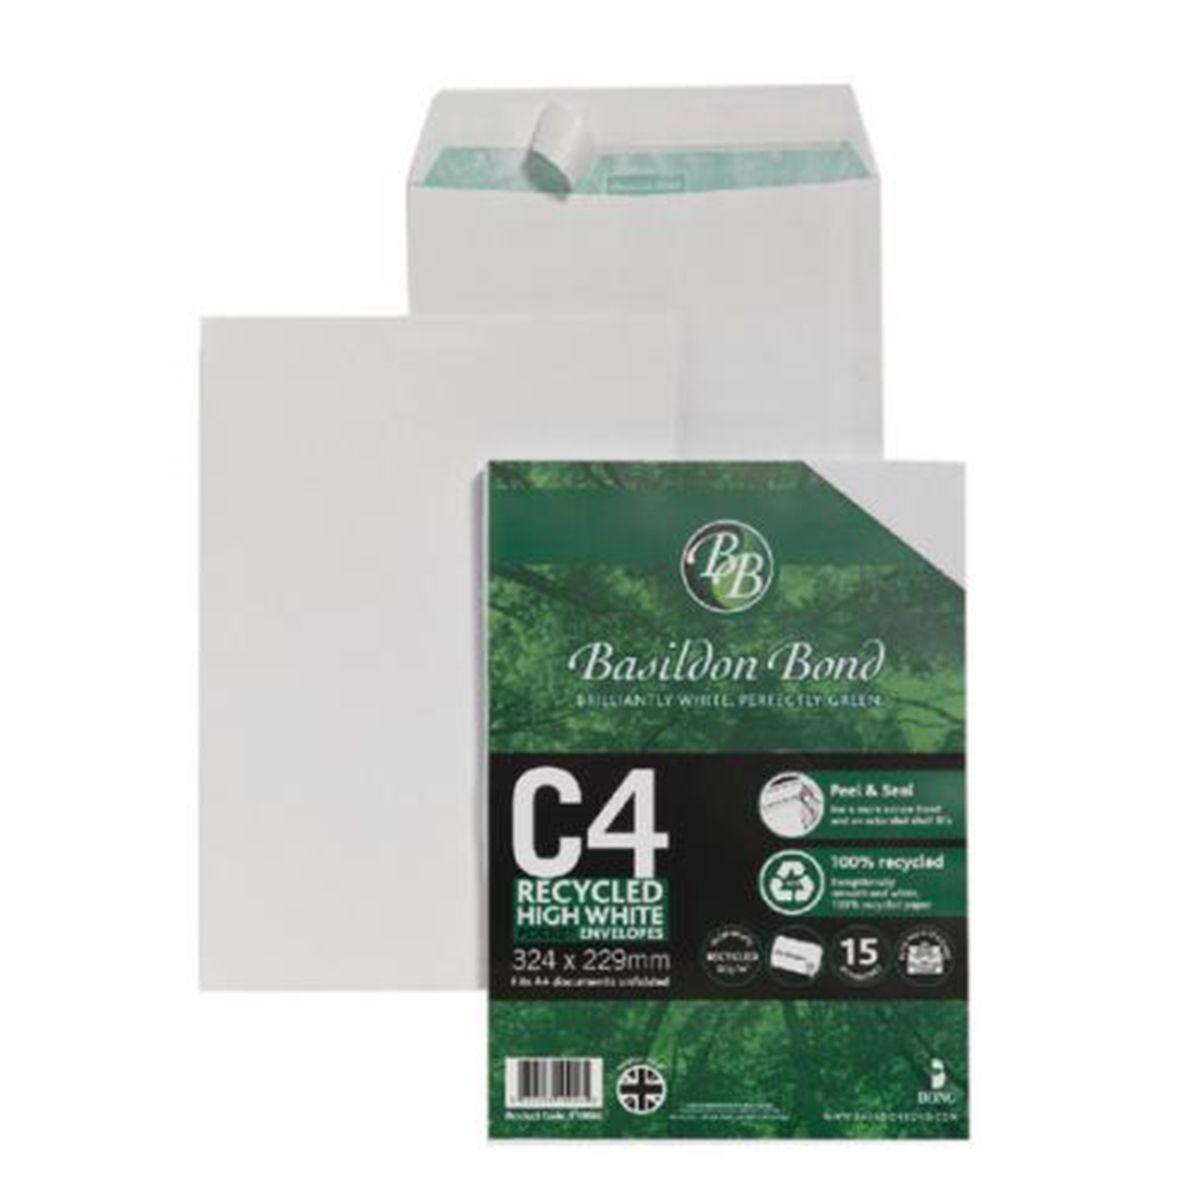 Basildon Bond Envelope C4 100gsm Peel and Seal Recycled Plain White - Pack of 15